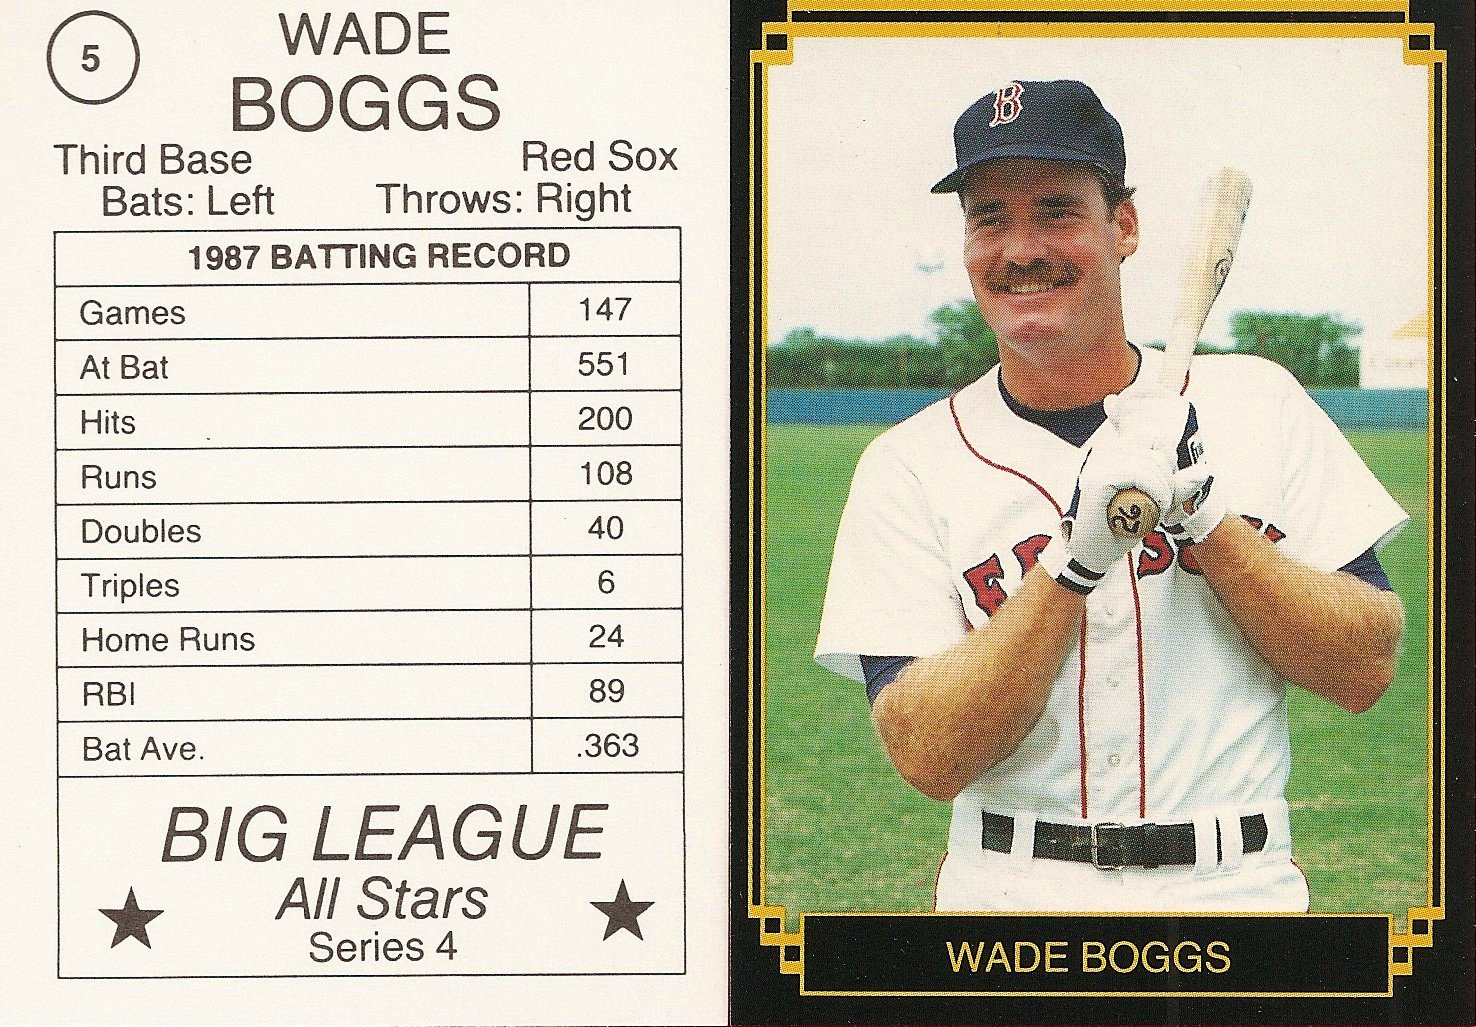 1988 Big League All-Stars Series 4